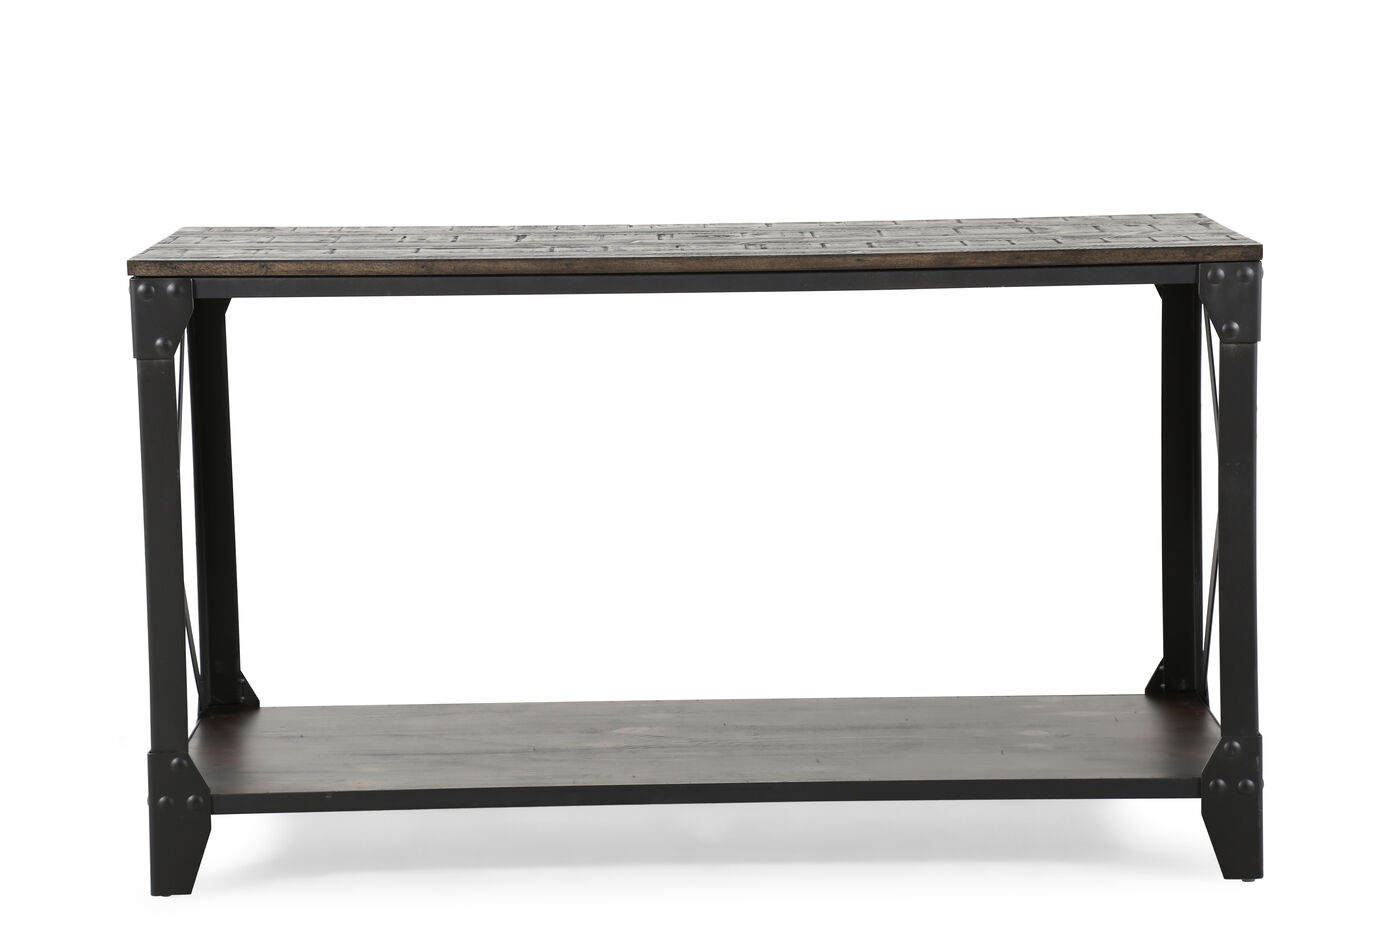 X Braced Contemporary Sofa Table In Gunmetal Black